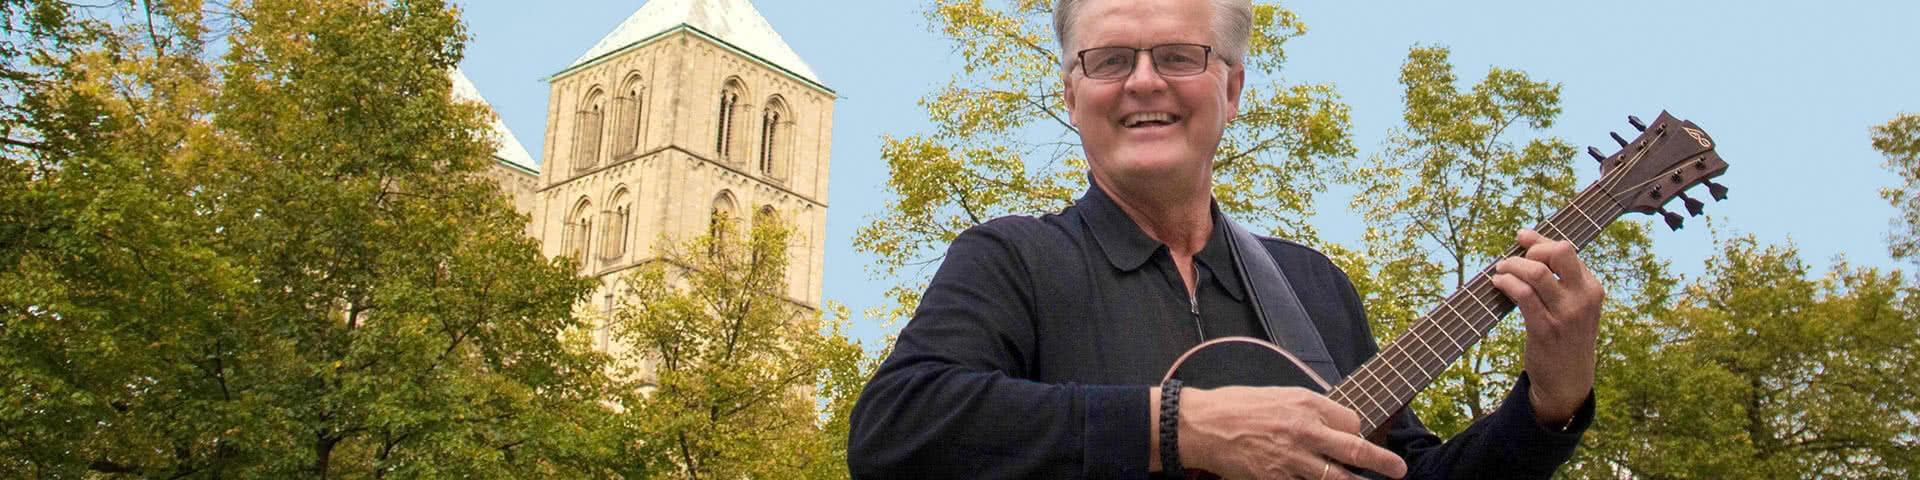 Sänger Clemens August vor dem St. Paulus Dom in Münster